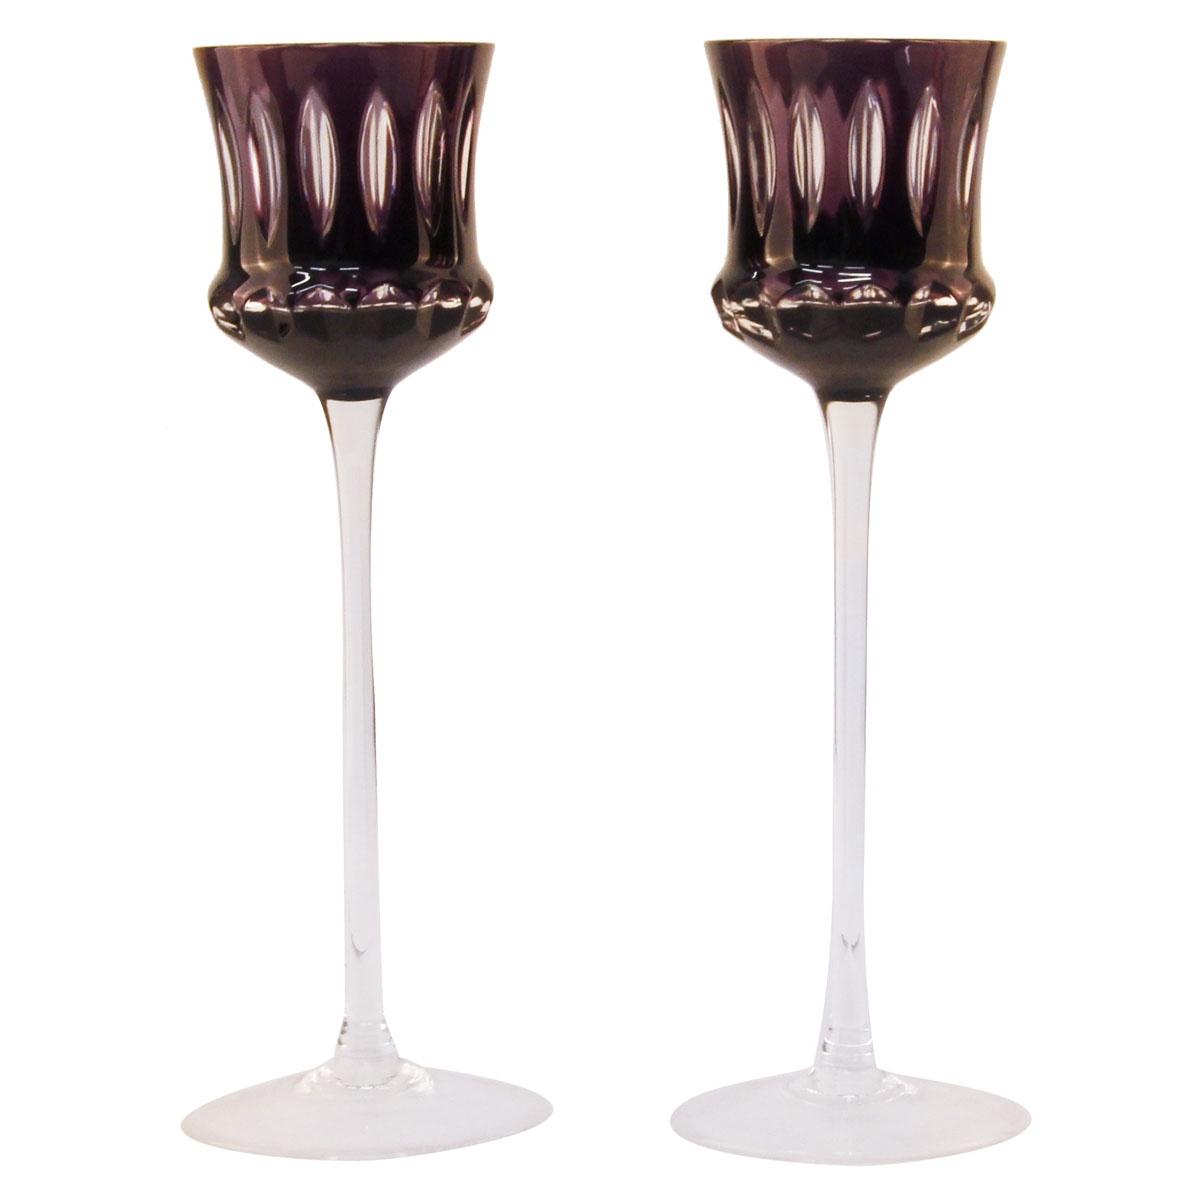 Бокалы для ликера от Faberge. Хрусталь, гранение. Faberge, Франция, 1990 год faberge